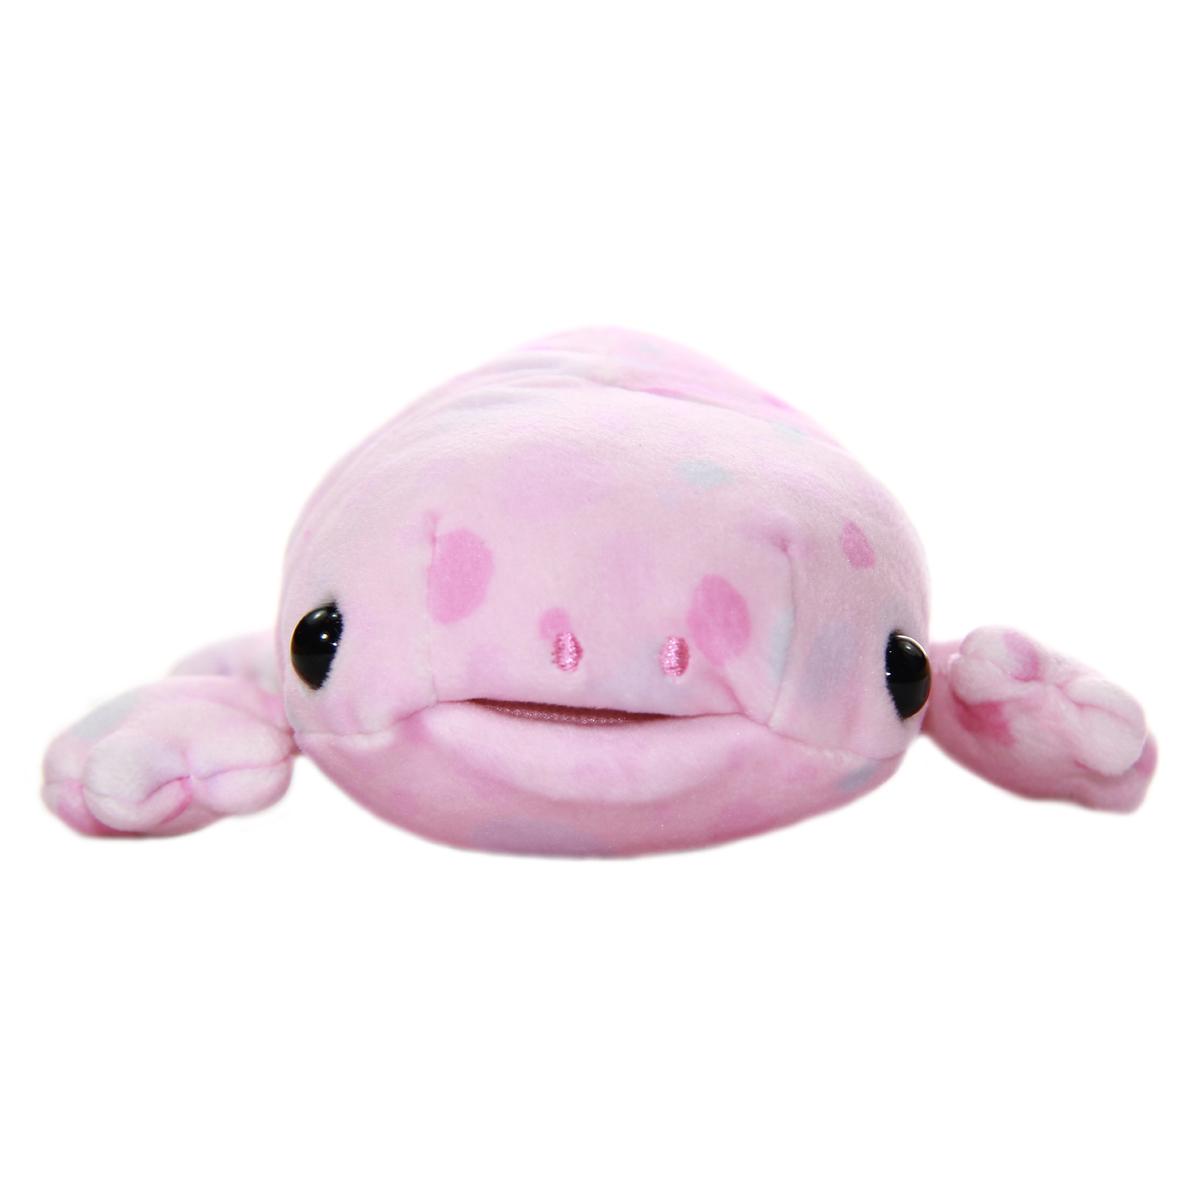 Mochi Puni Salamander Plush Doll, Pink 9 Inches